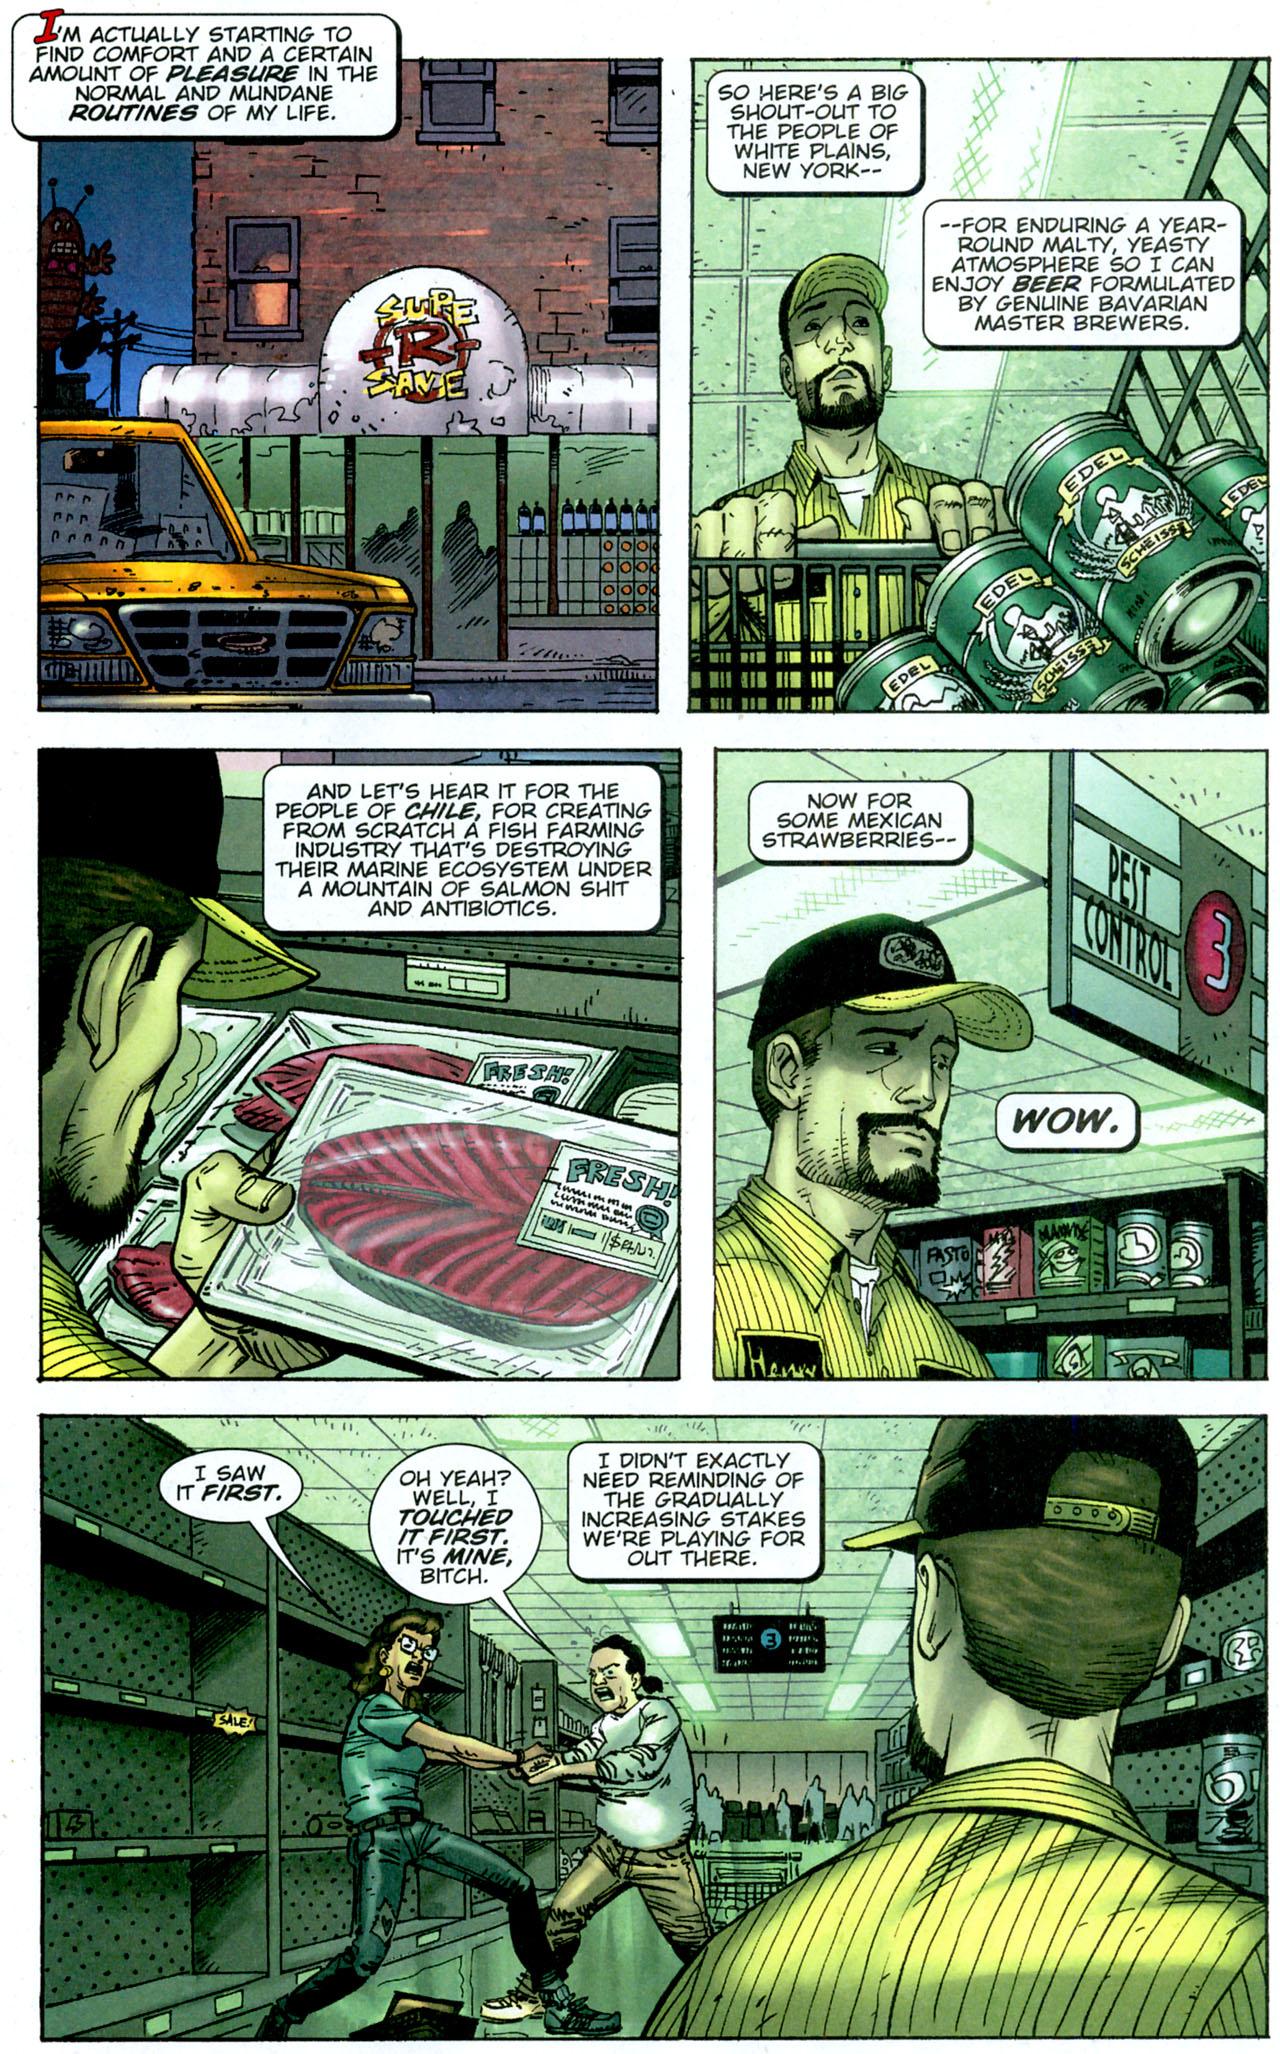 Read online The Exterminators comic -  Issue #14 - 22